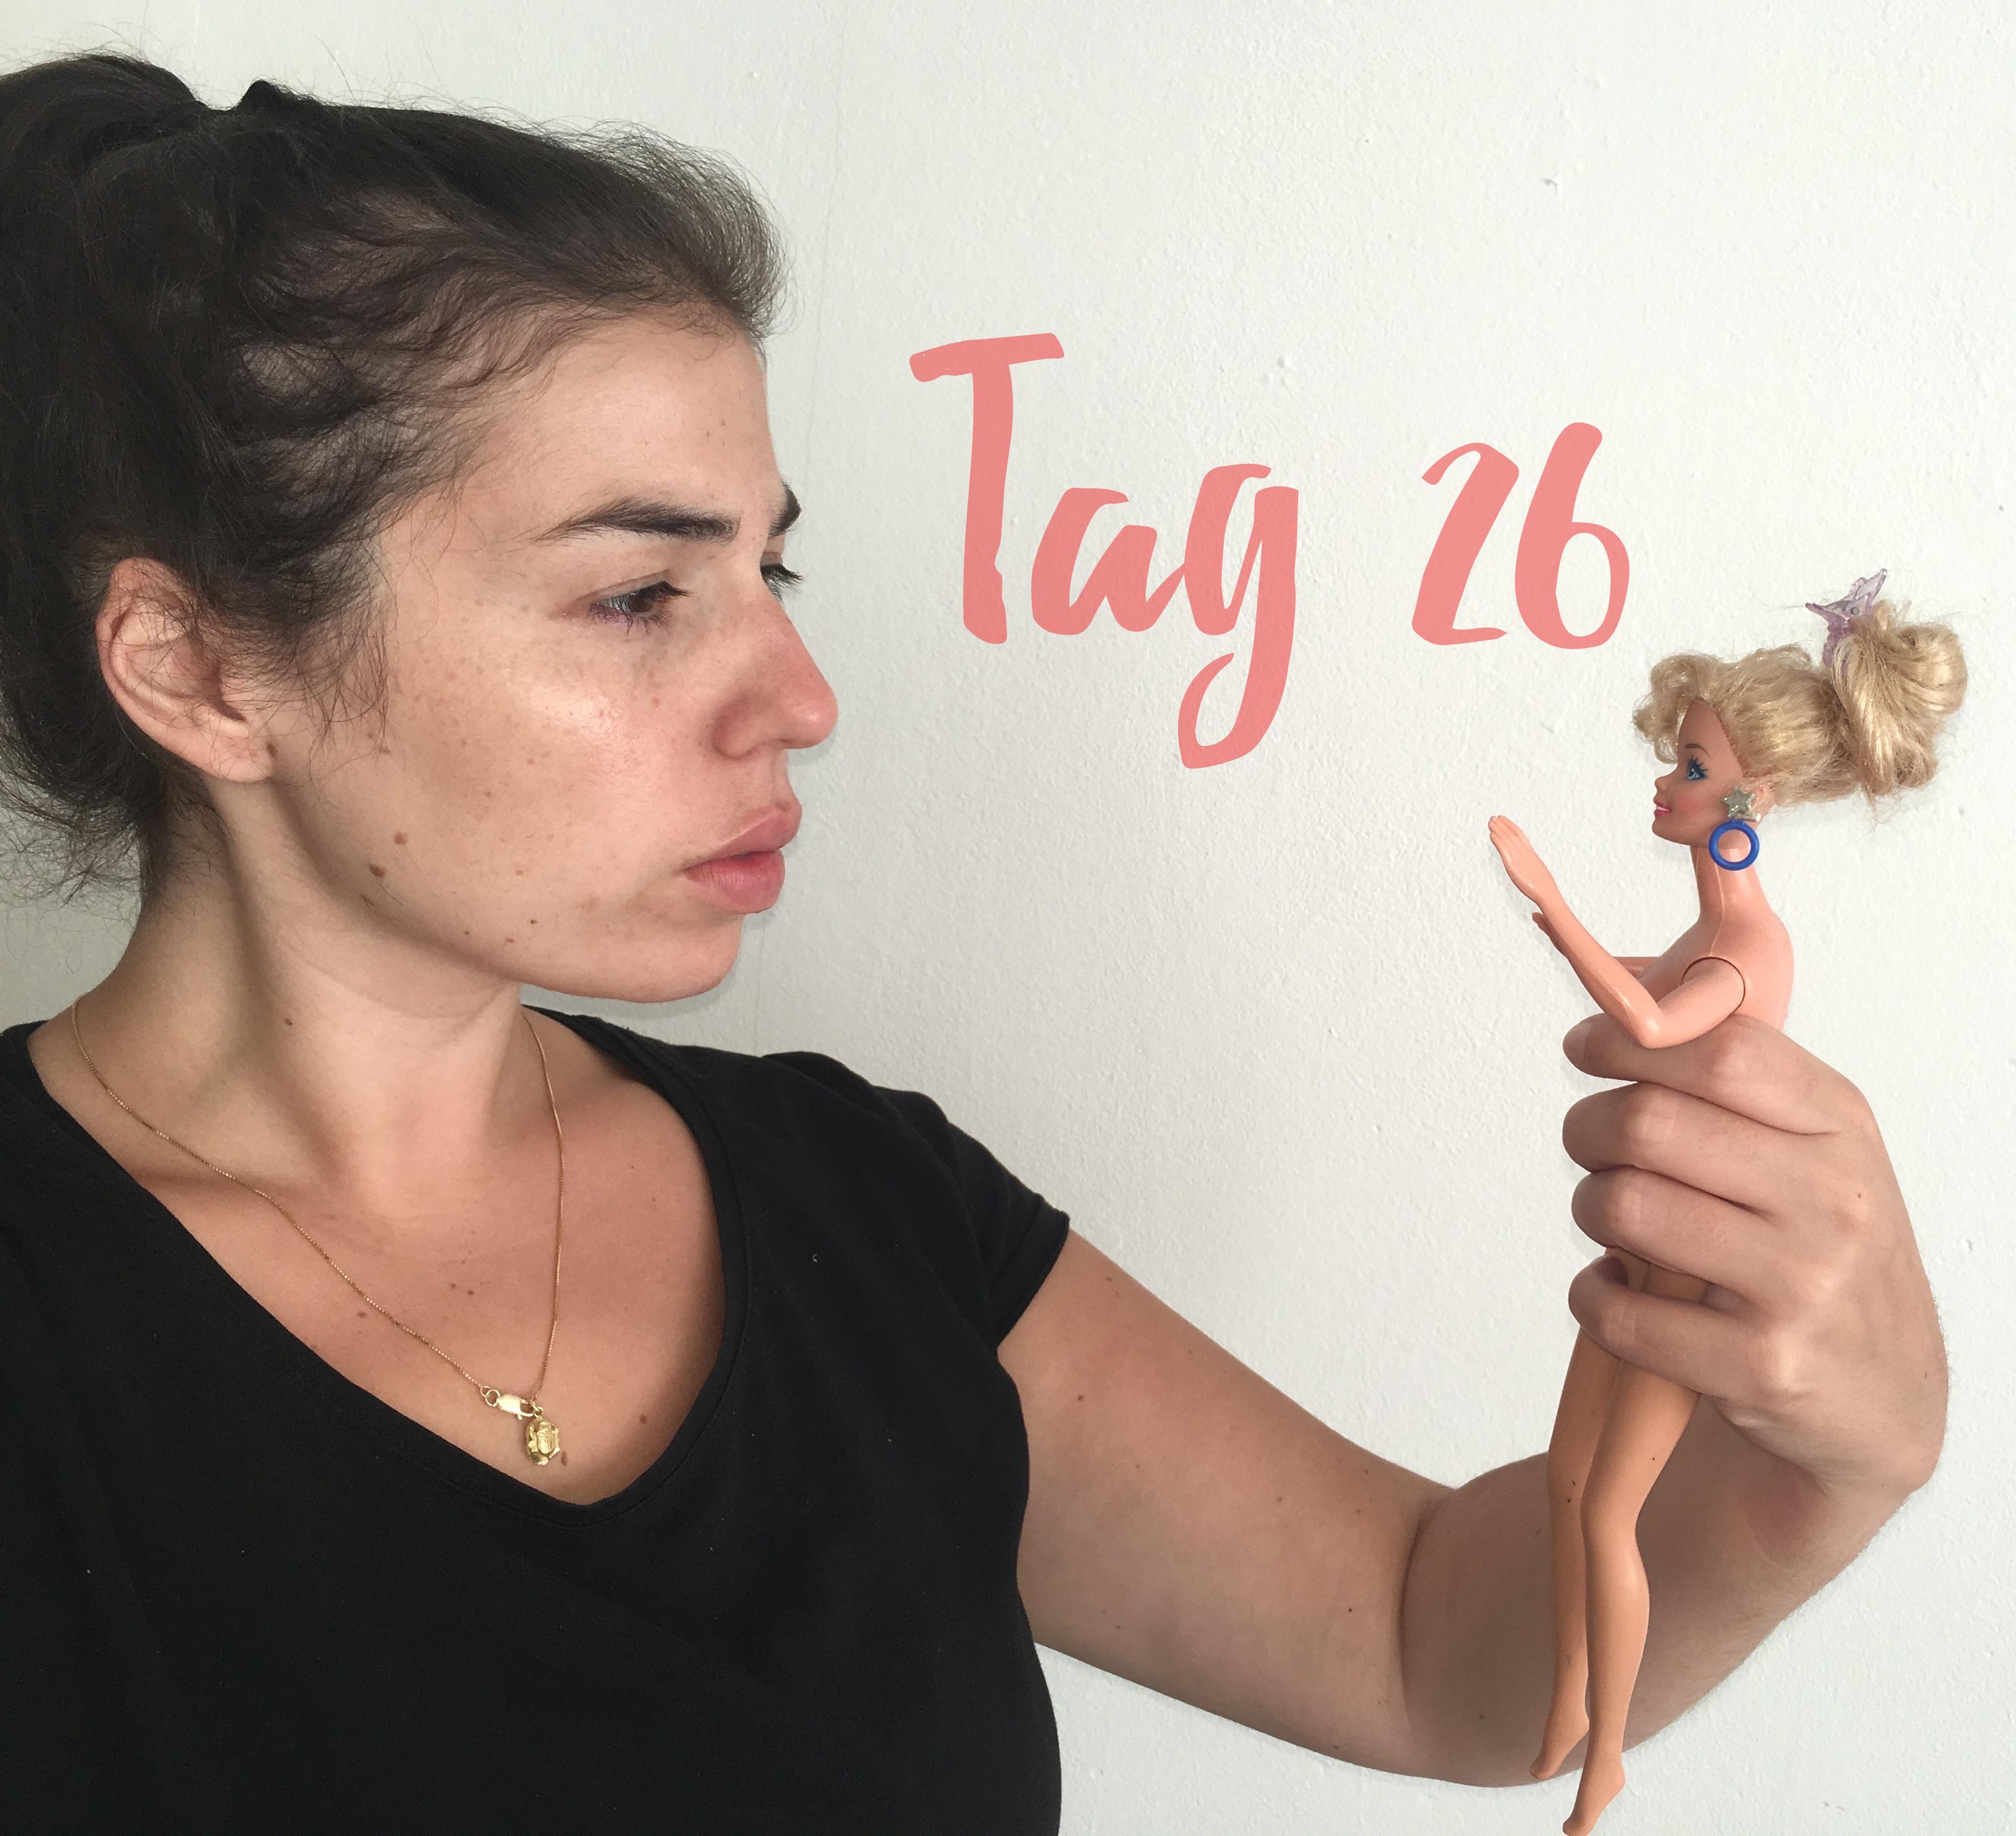 Tag26